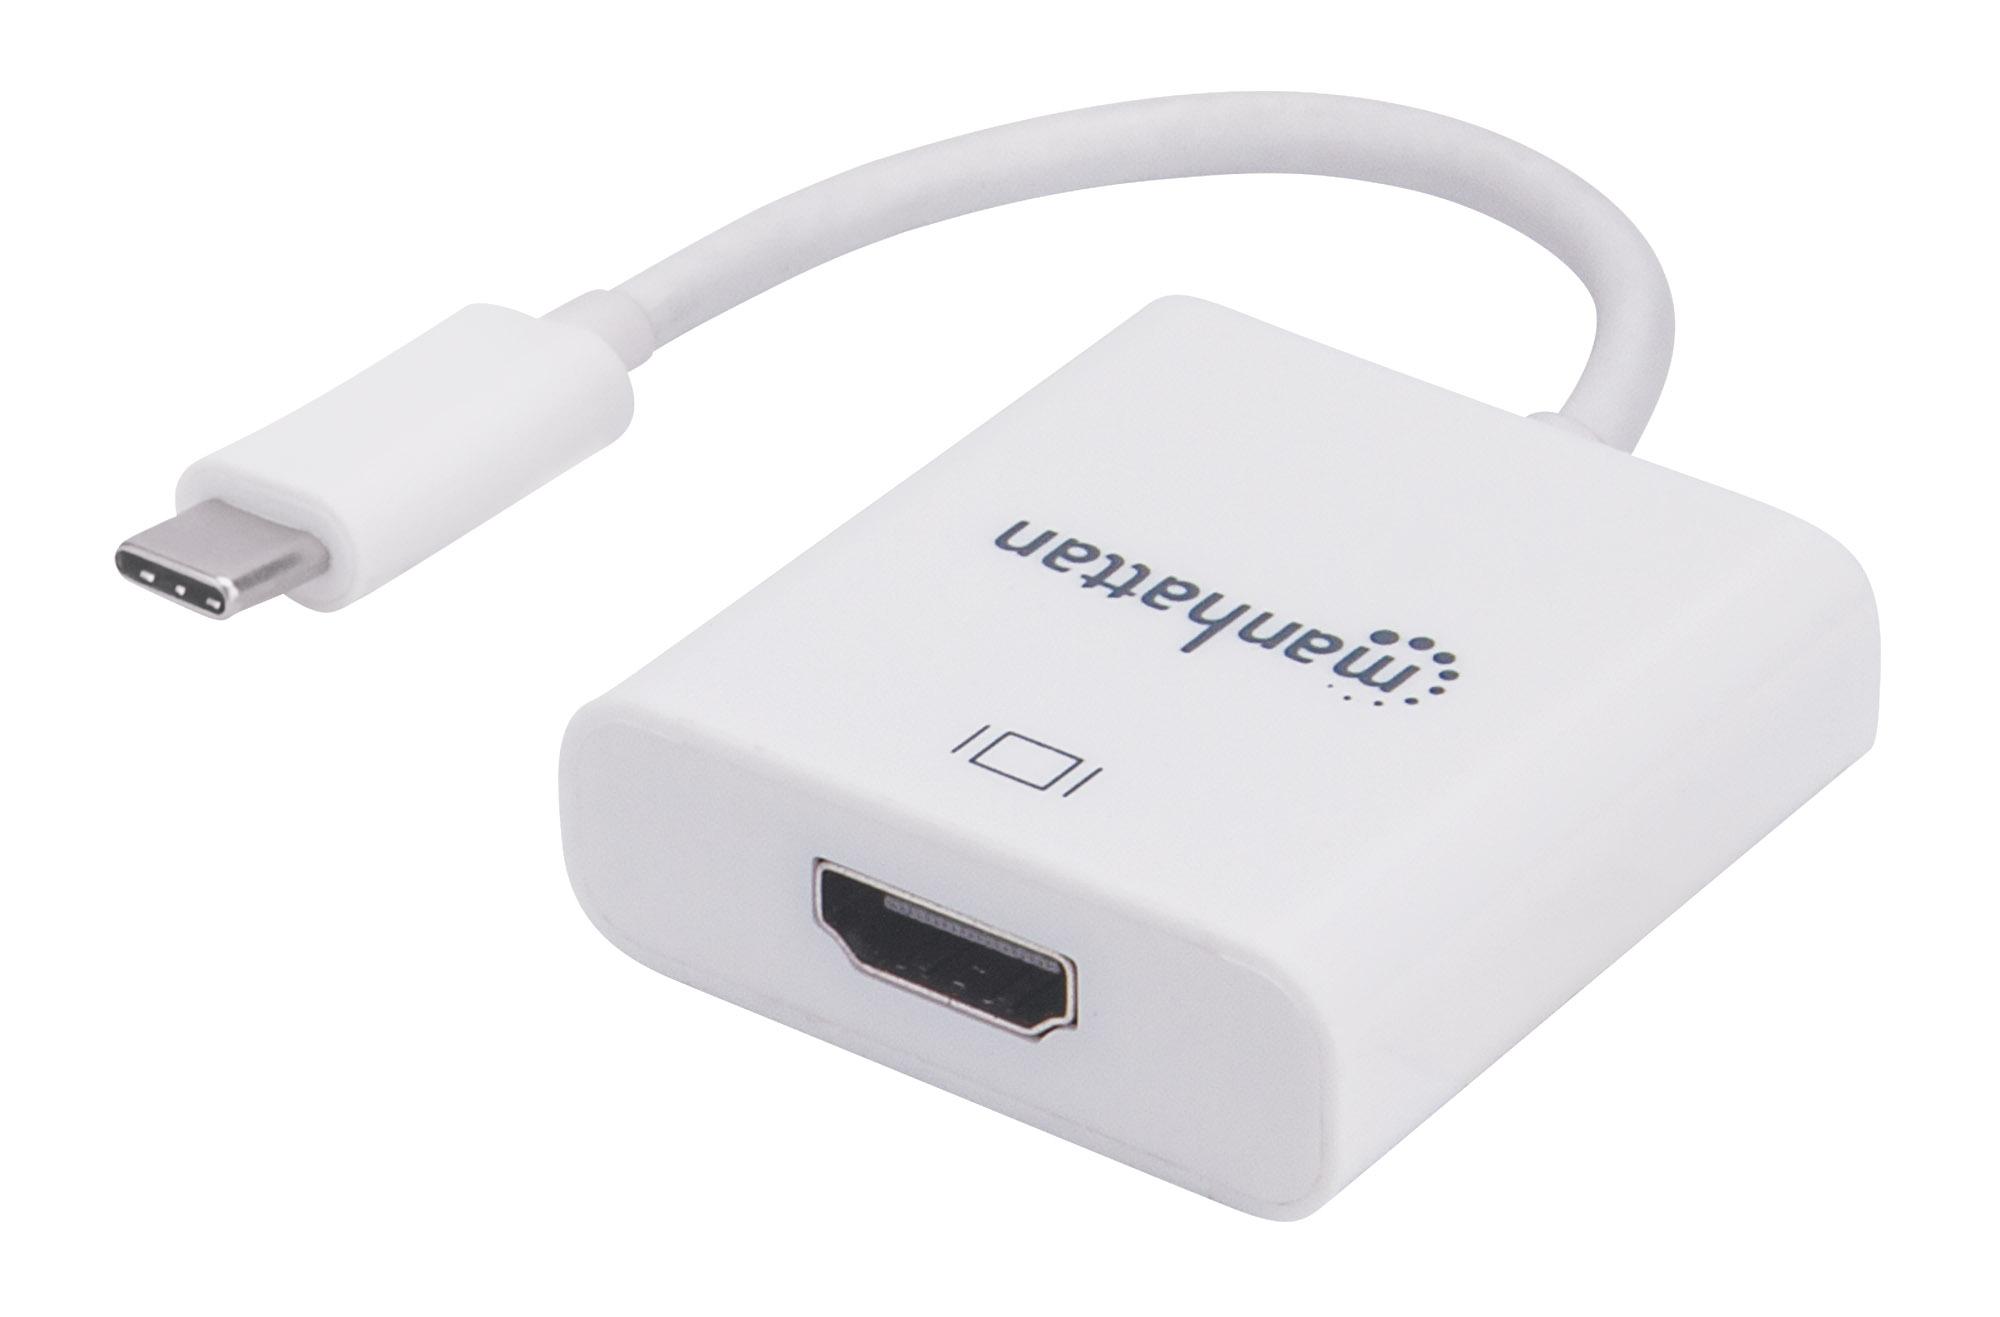 USB-C to HDMI Converter